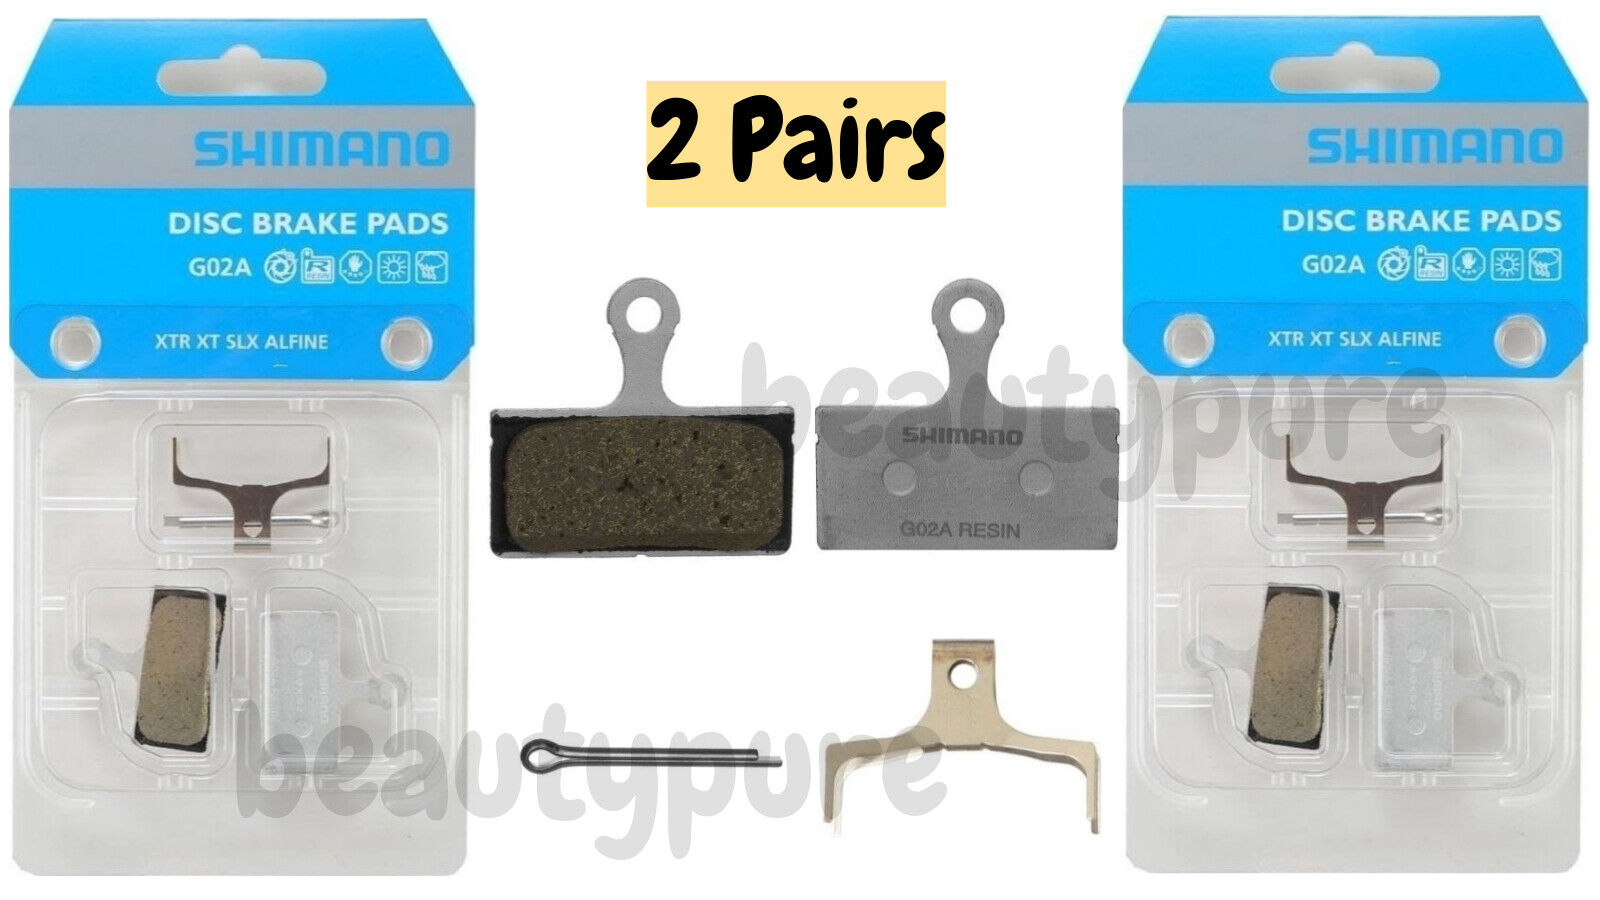 2 Pairs Shimano G02A Resin Disc Brake Pad Pair /& Spring XTR BR-M9020 NIB